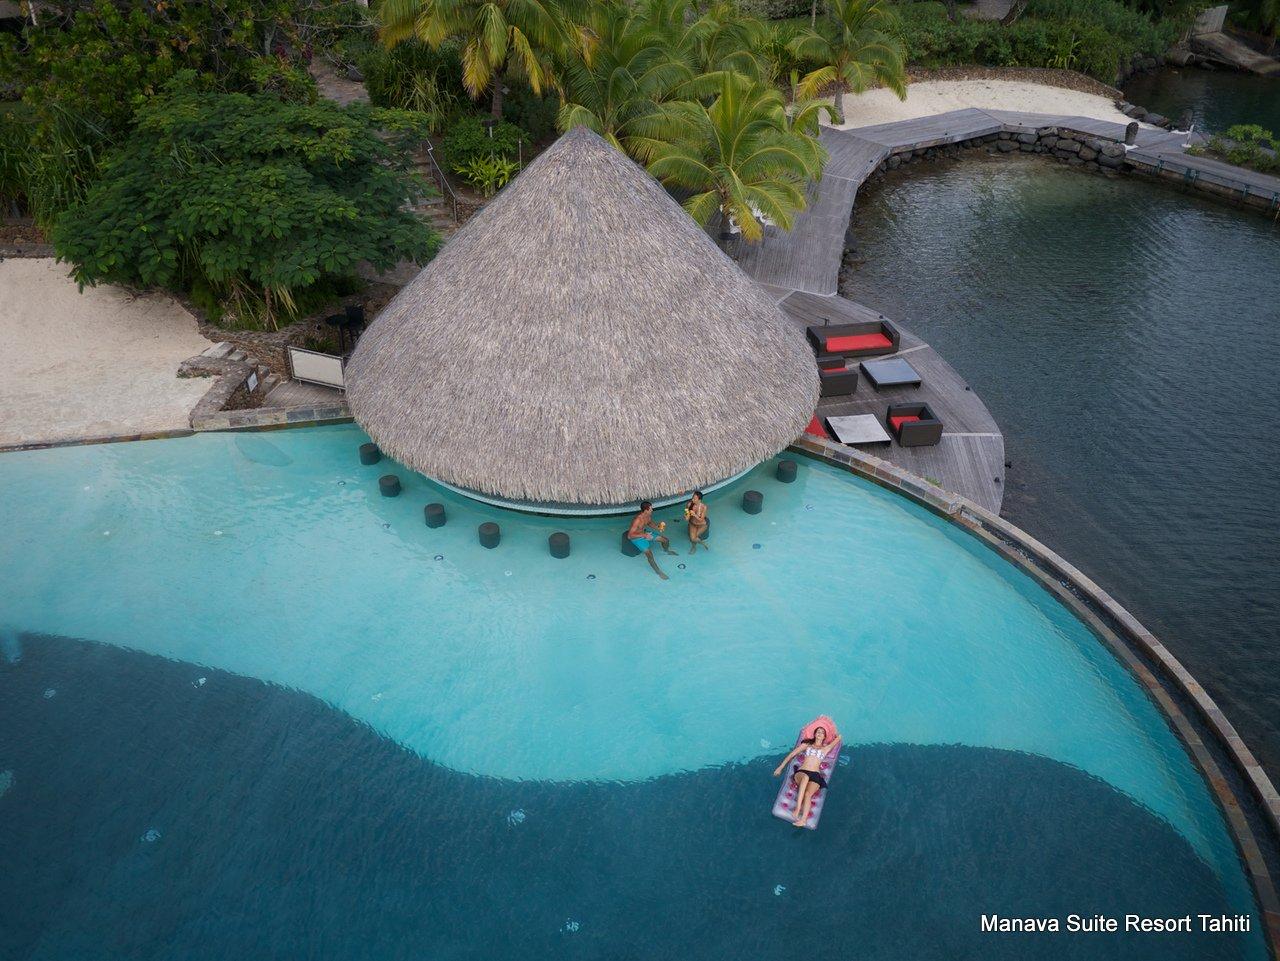 Tahiti 7 Night Escape - Manava Upgrade Package